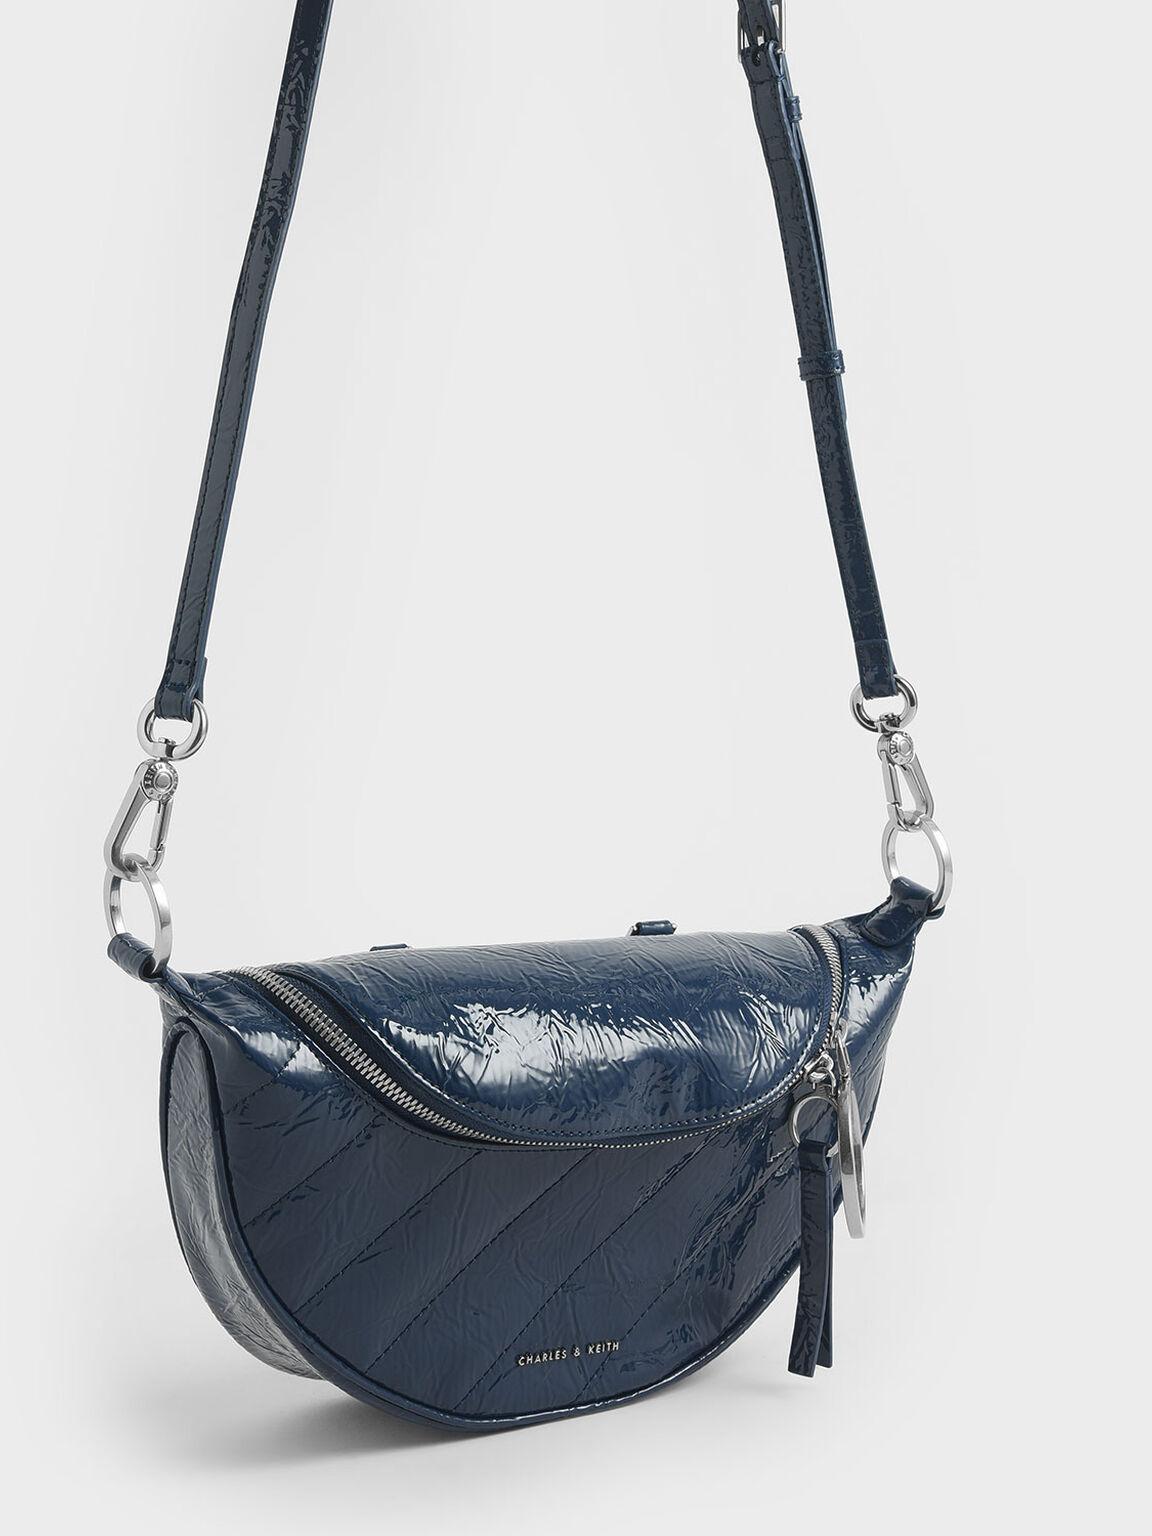 Wrinkled Patent Semi-Circle Crossbody Bag, Blue, hi-res